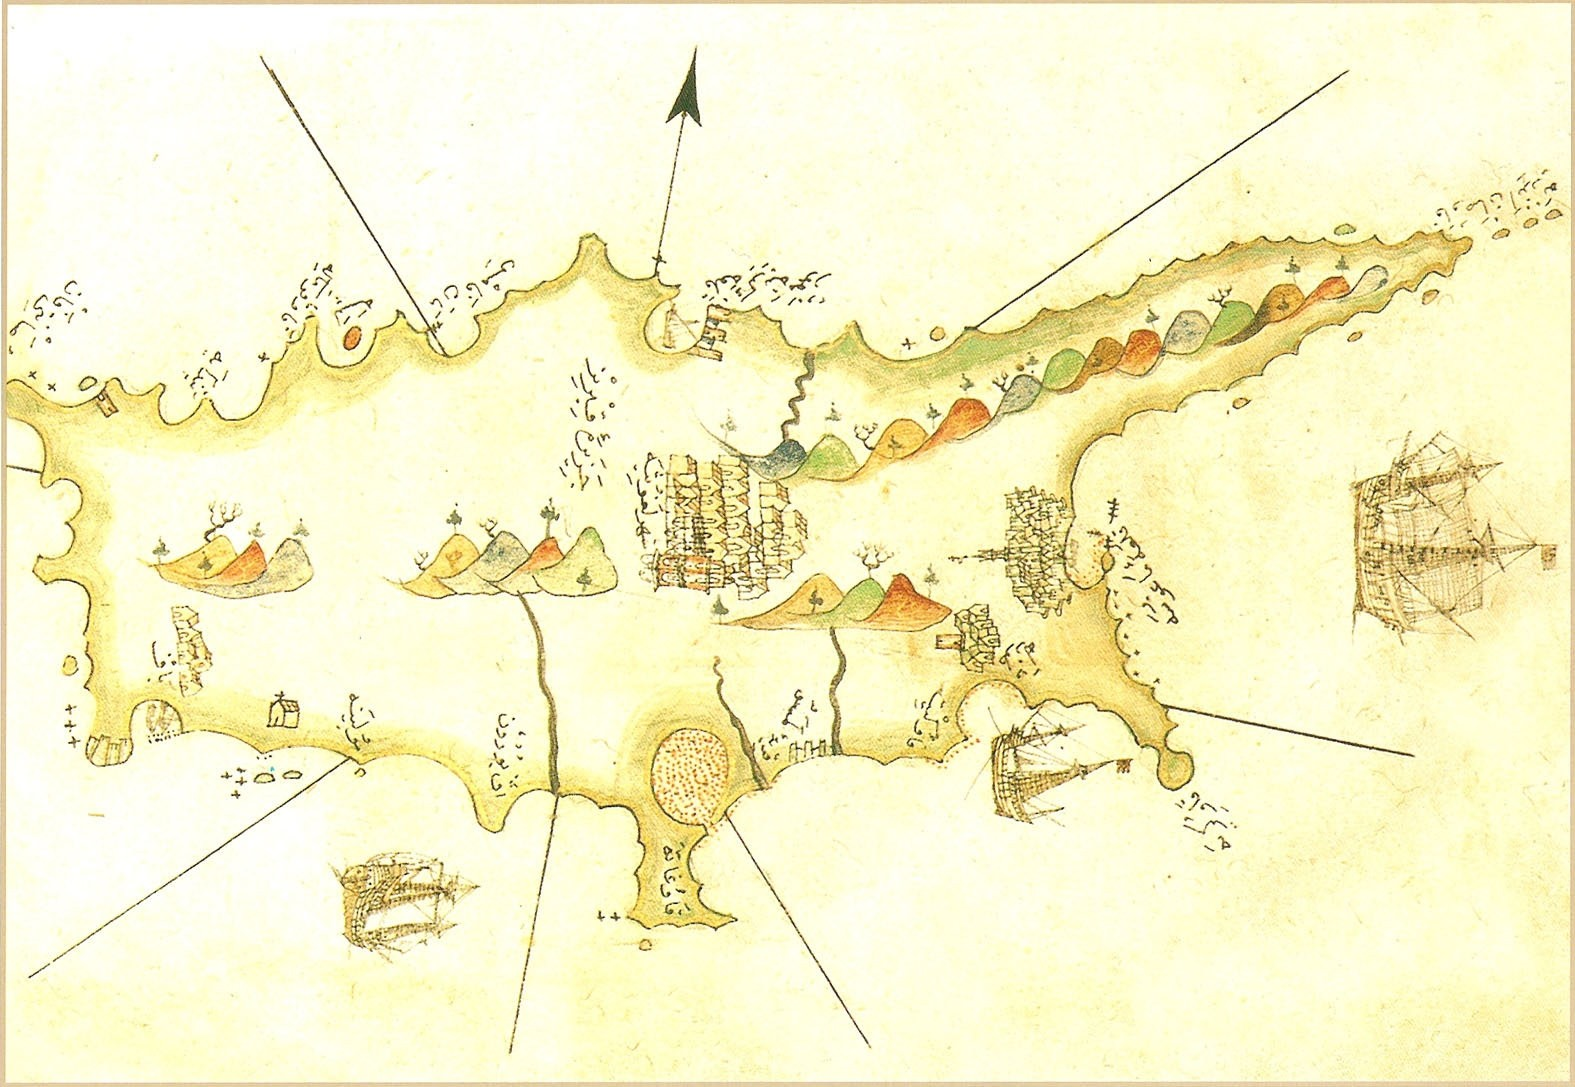 Map of Cyprus drawn by Ottoman Admiral Piri Reis.